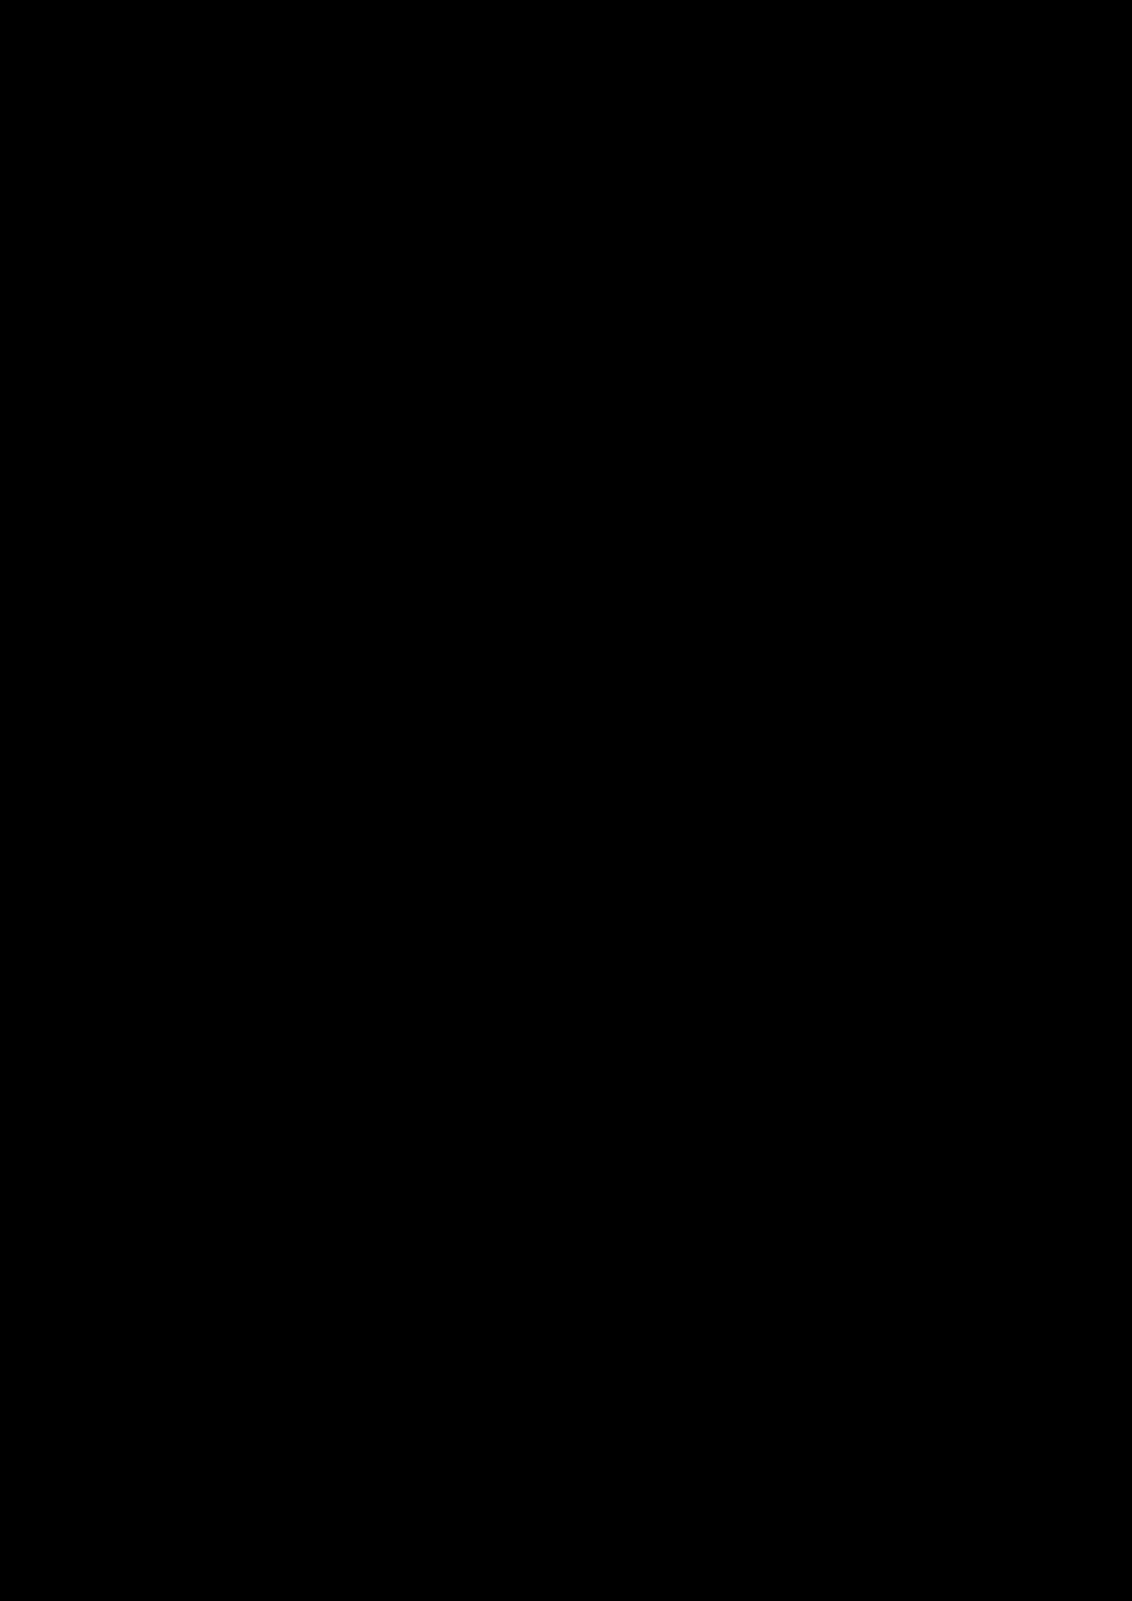 Prosti slide, Image 21